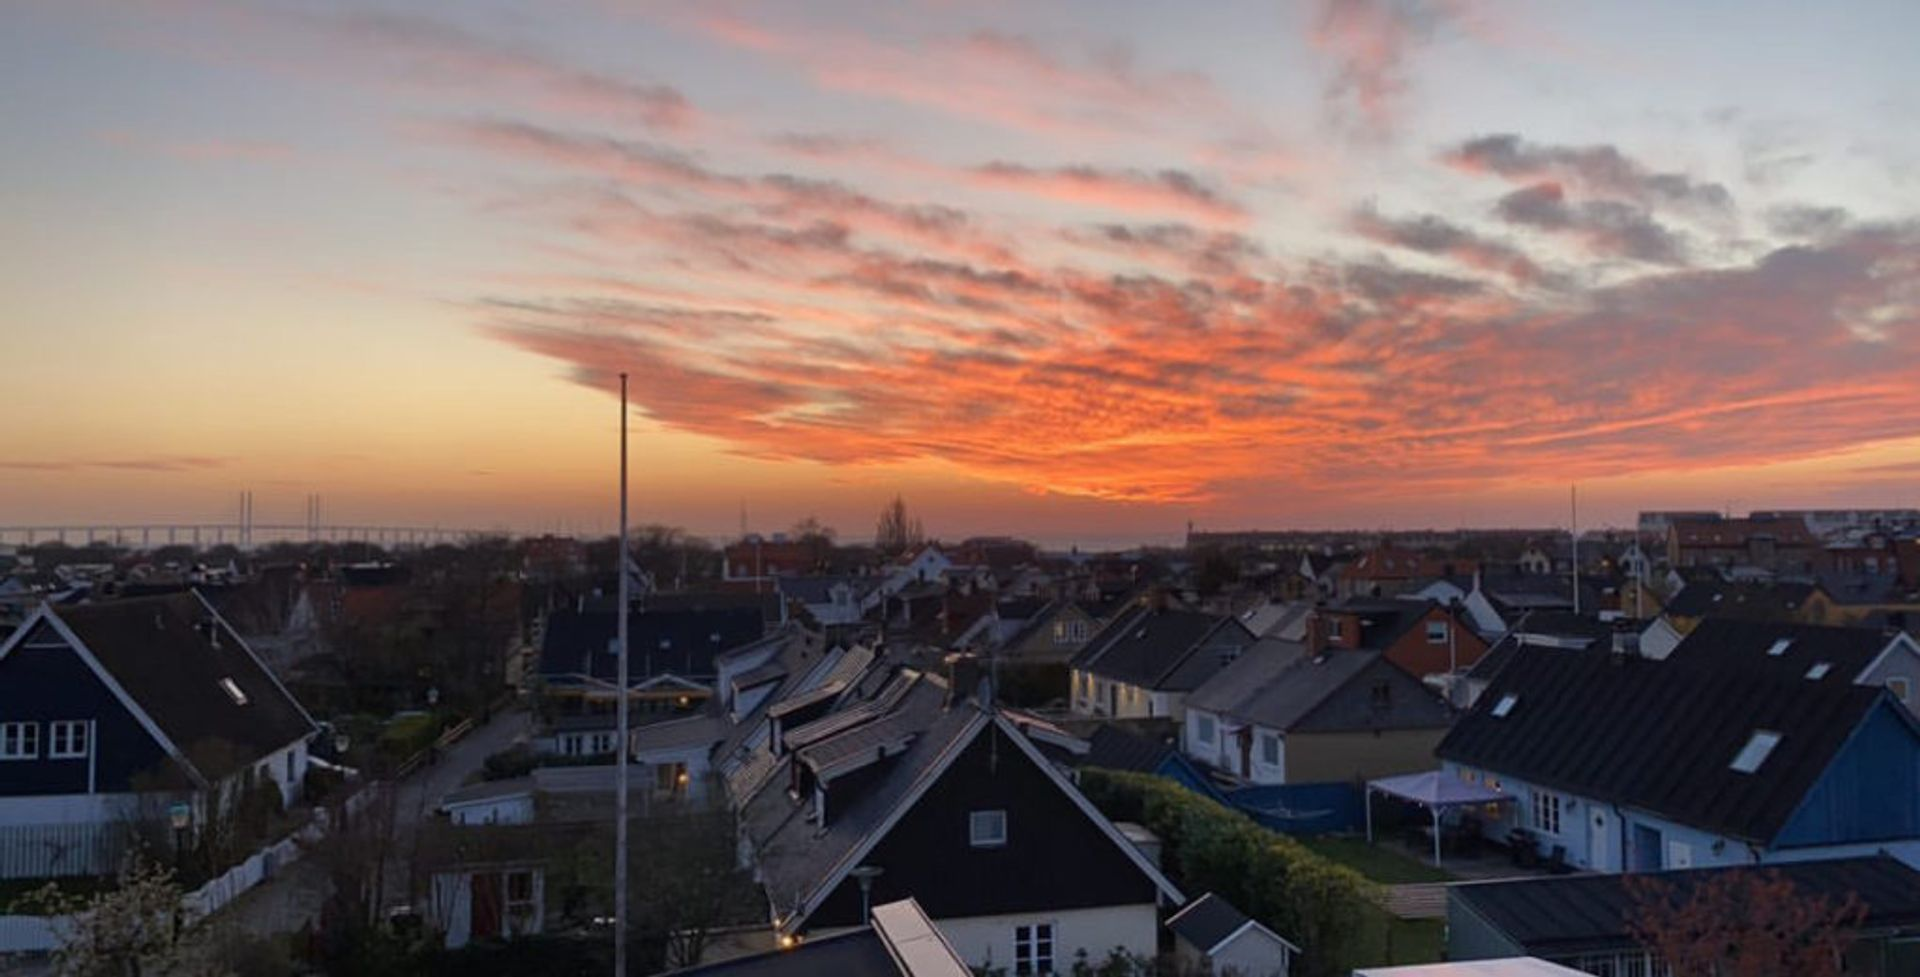 Sunset over residential houses in Malmö.